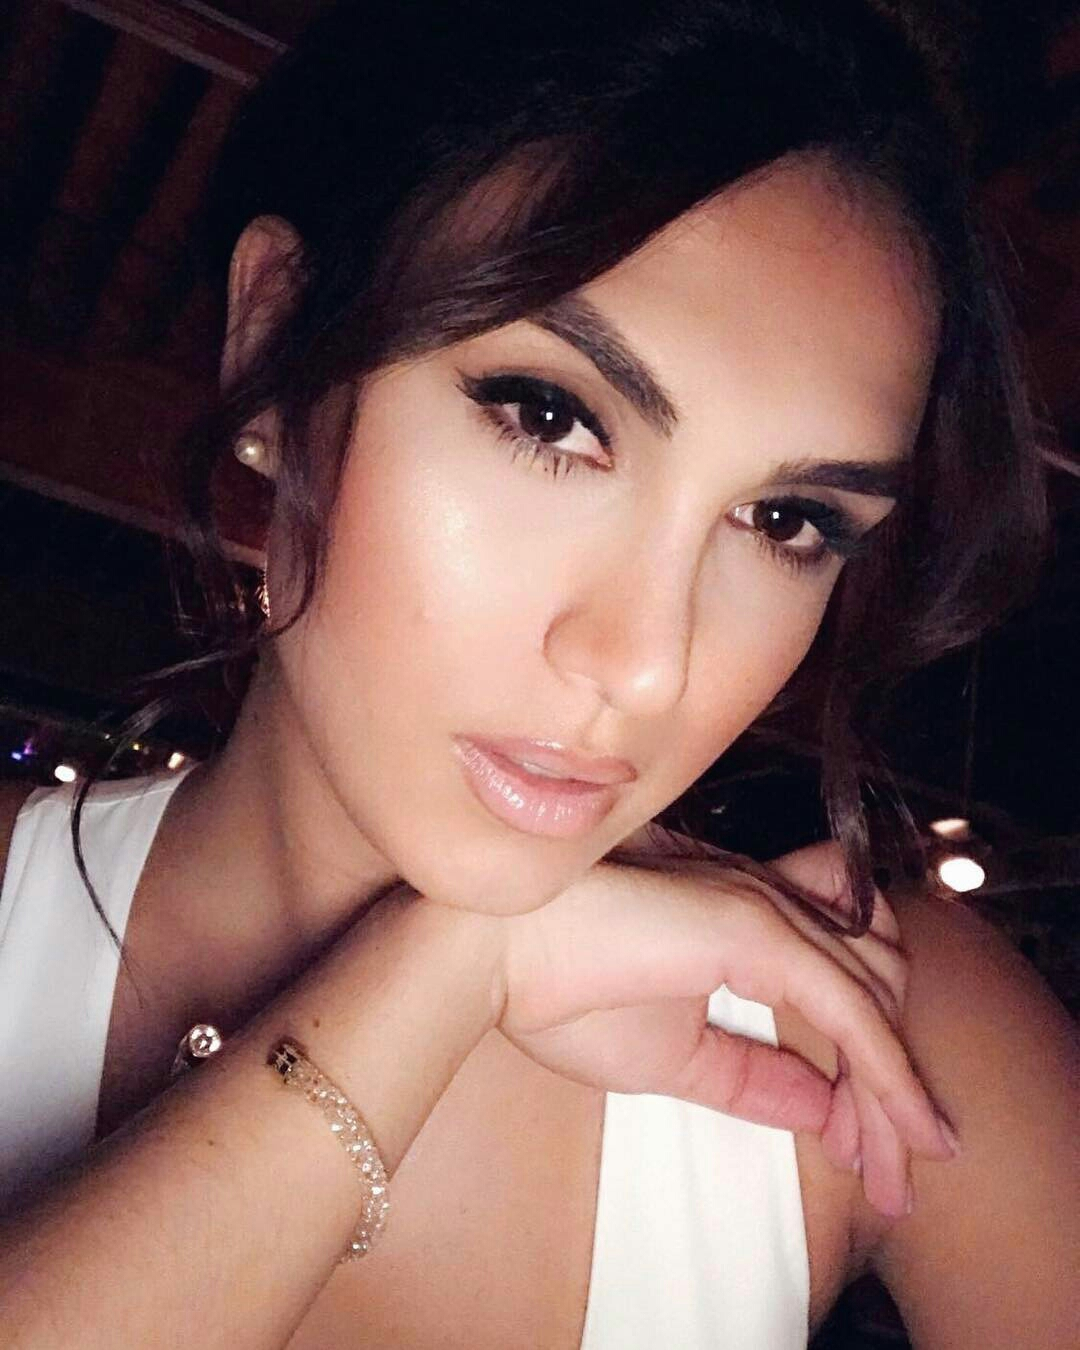 Isabella Santiago - Most Gorgeous Venezuelan Trans Women